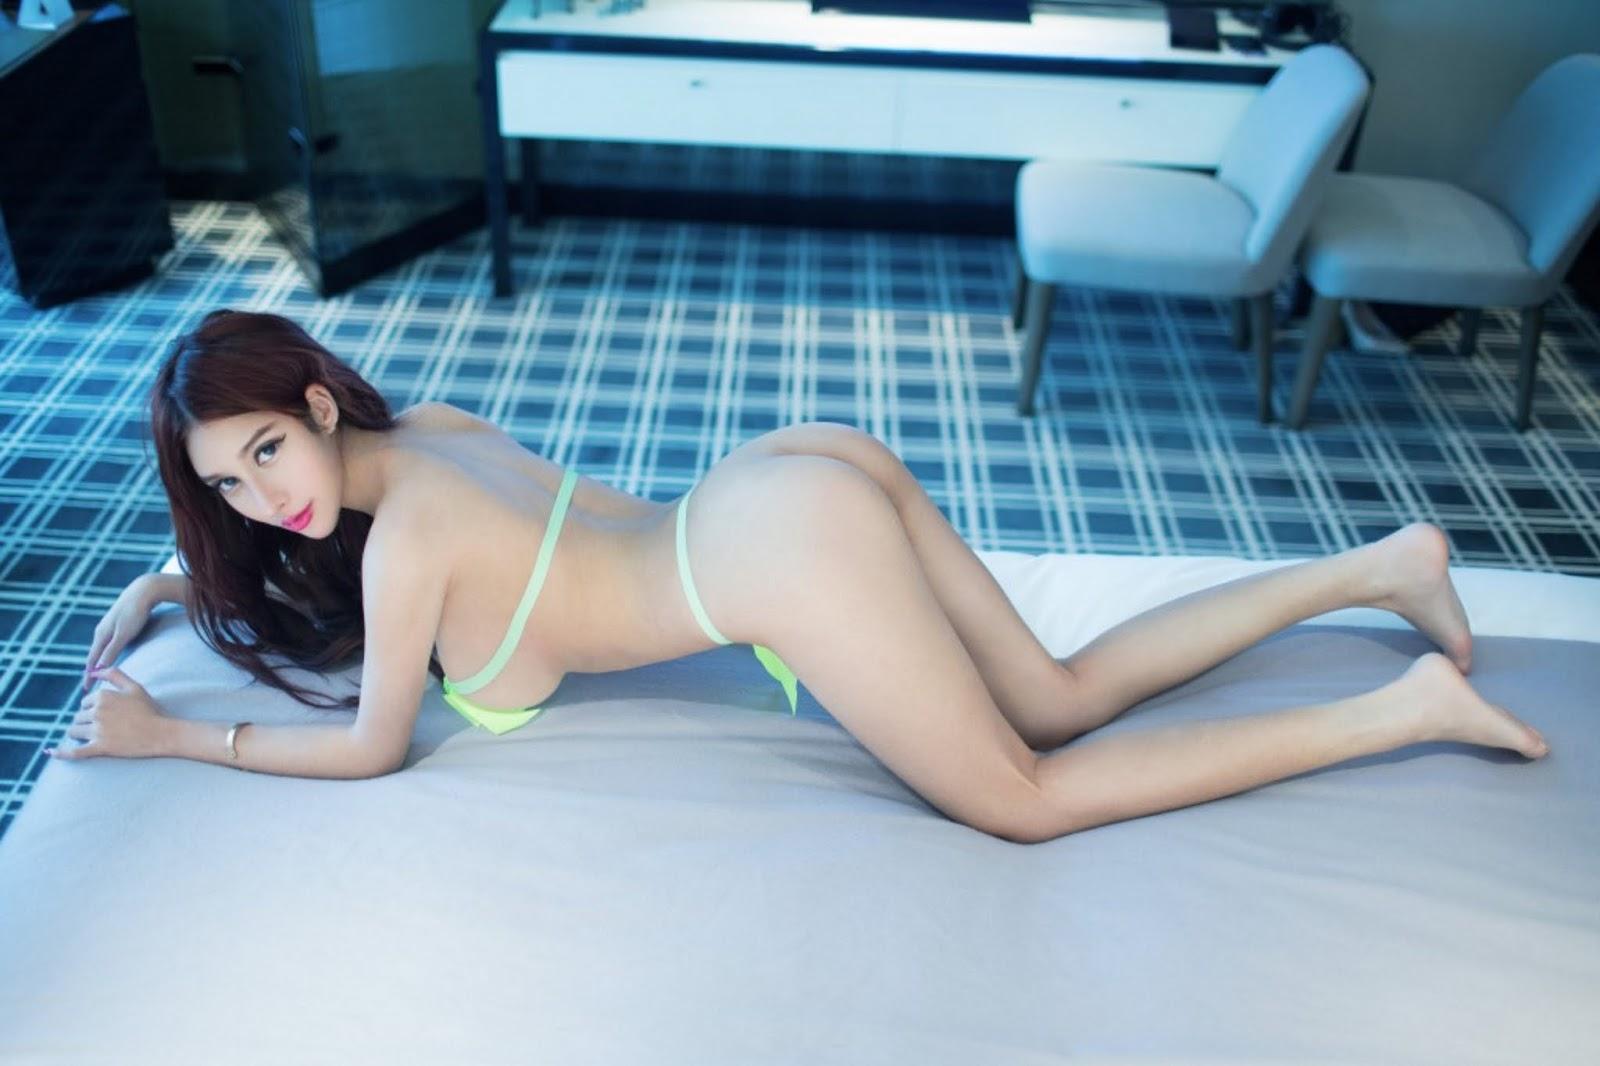 %25C2%25B1 %25C2%25B1 35 - Model Nude TUIGIRL NO.49 Beauty Body Tits